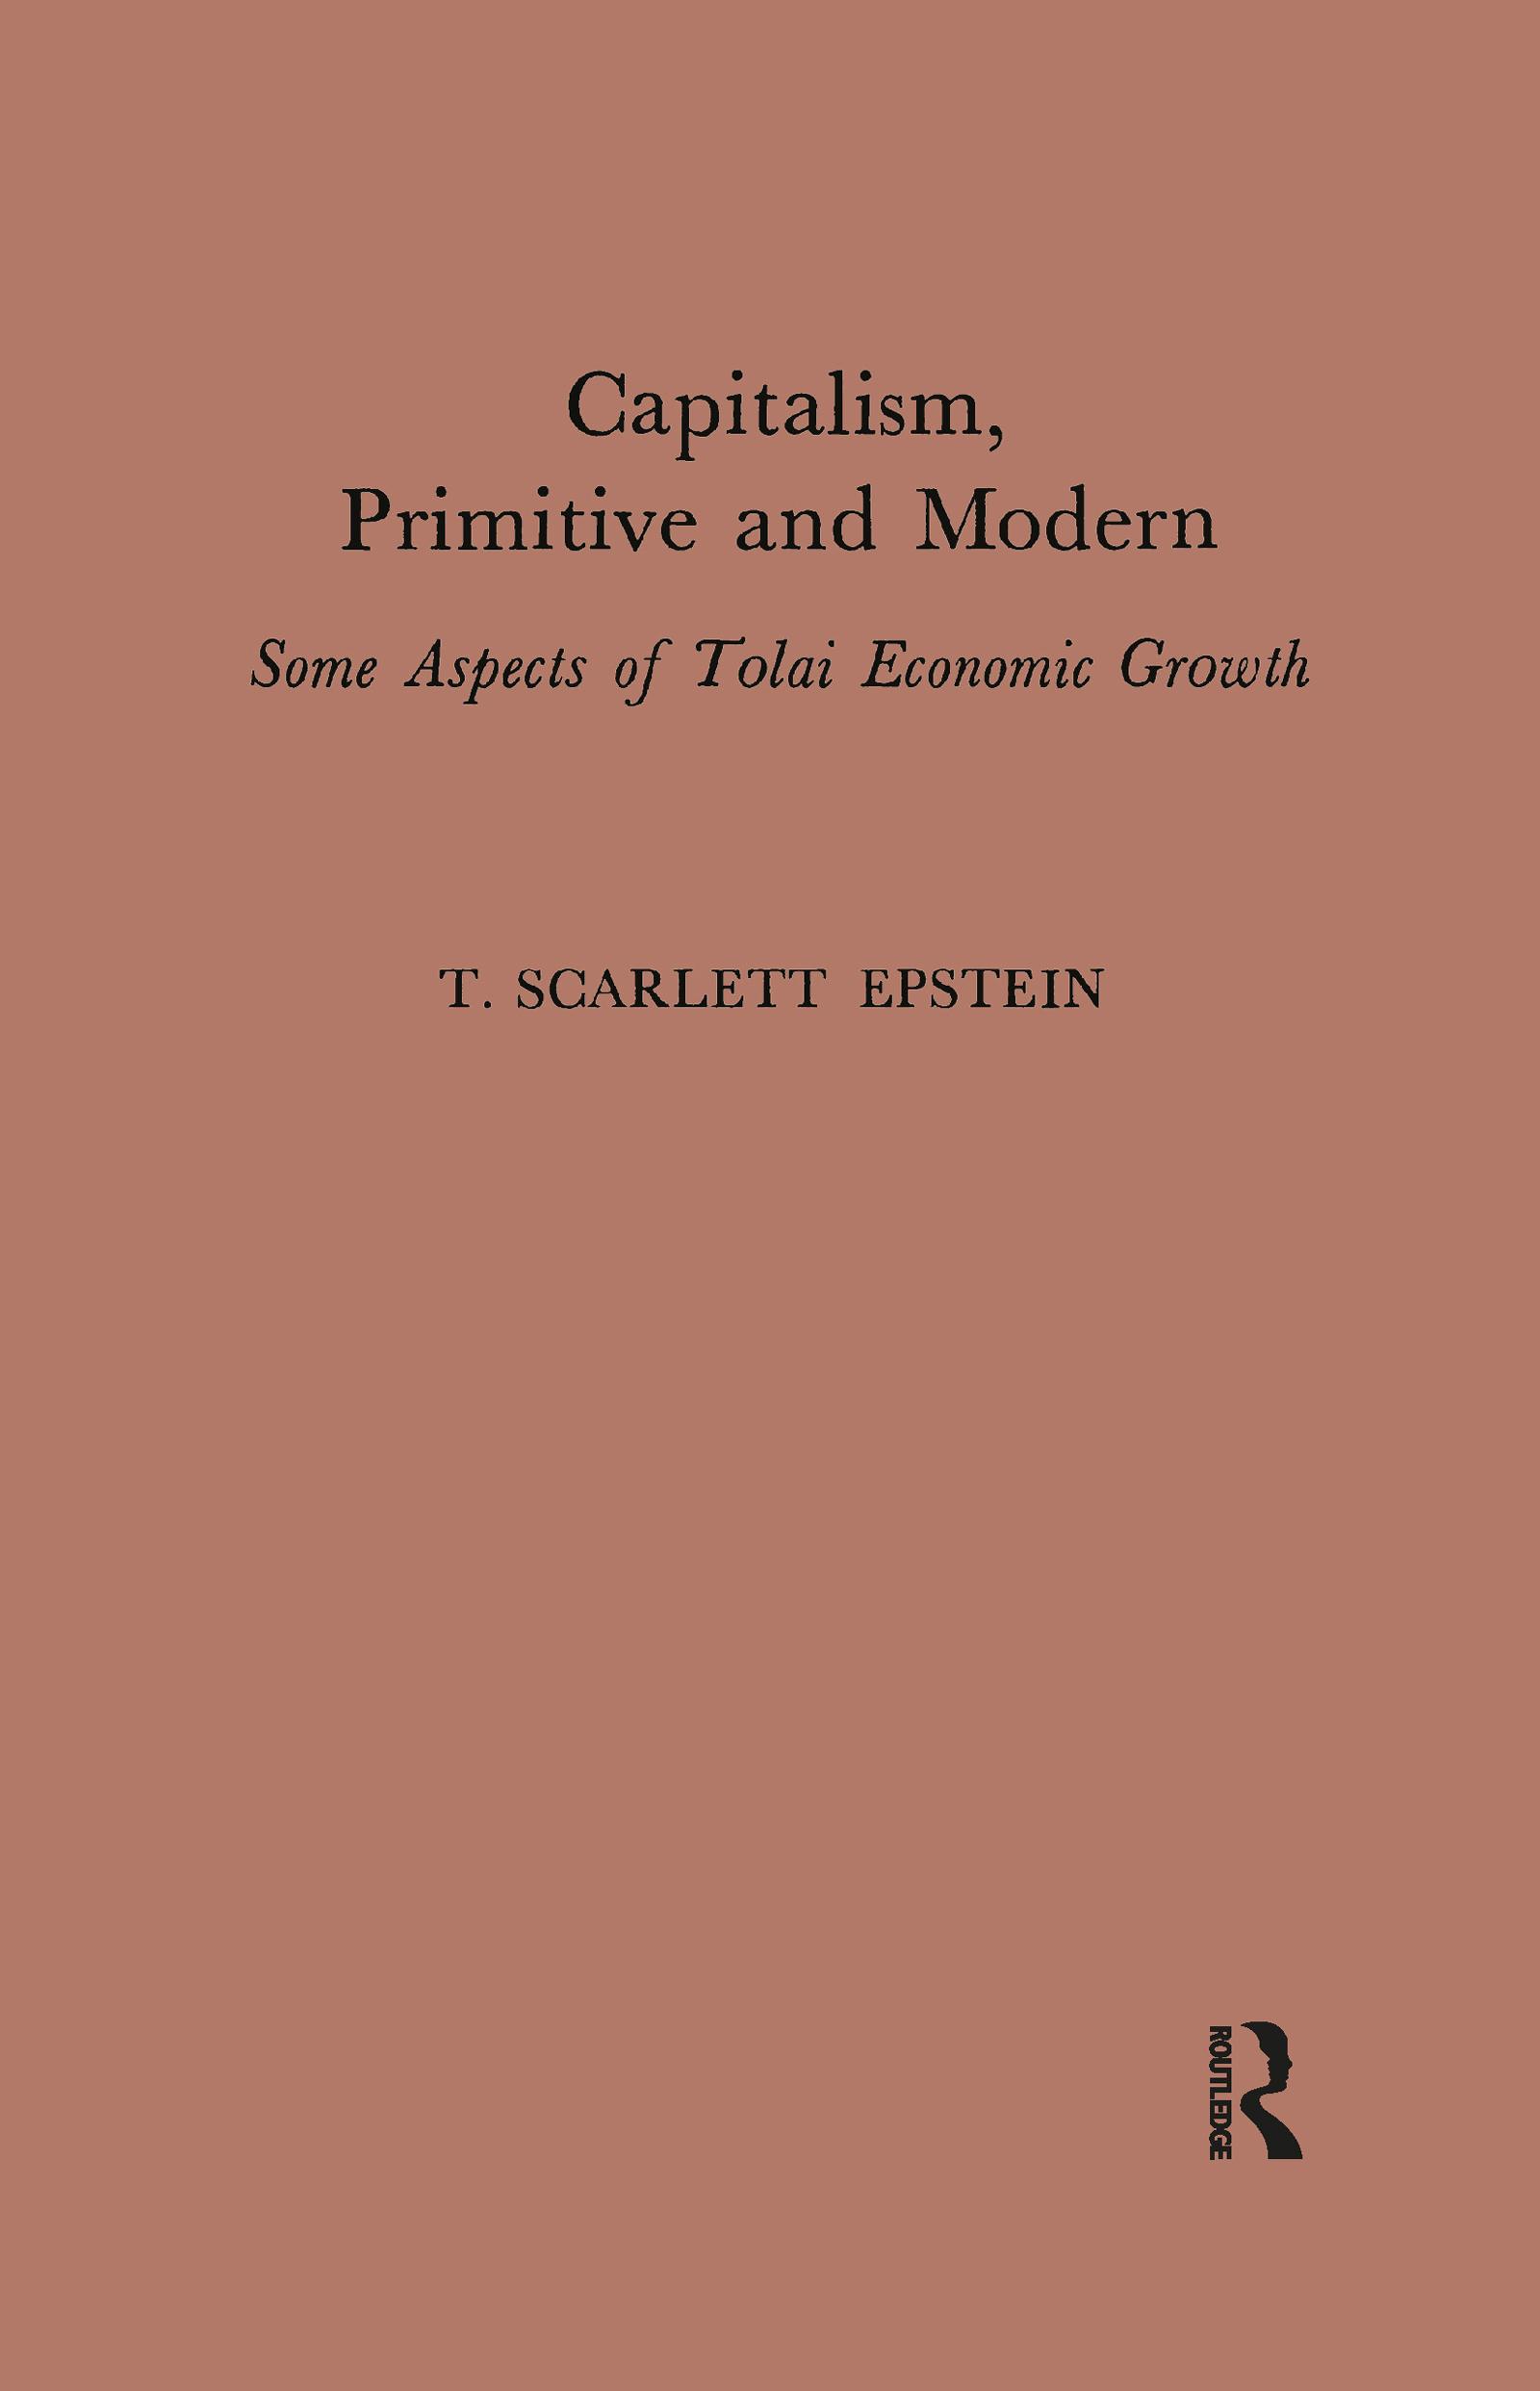 Capitalism, Primitive and Modern